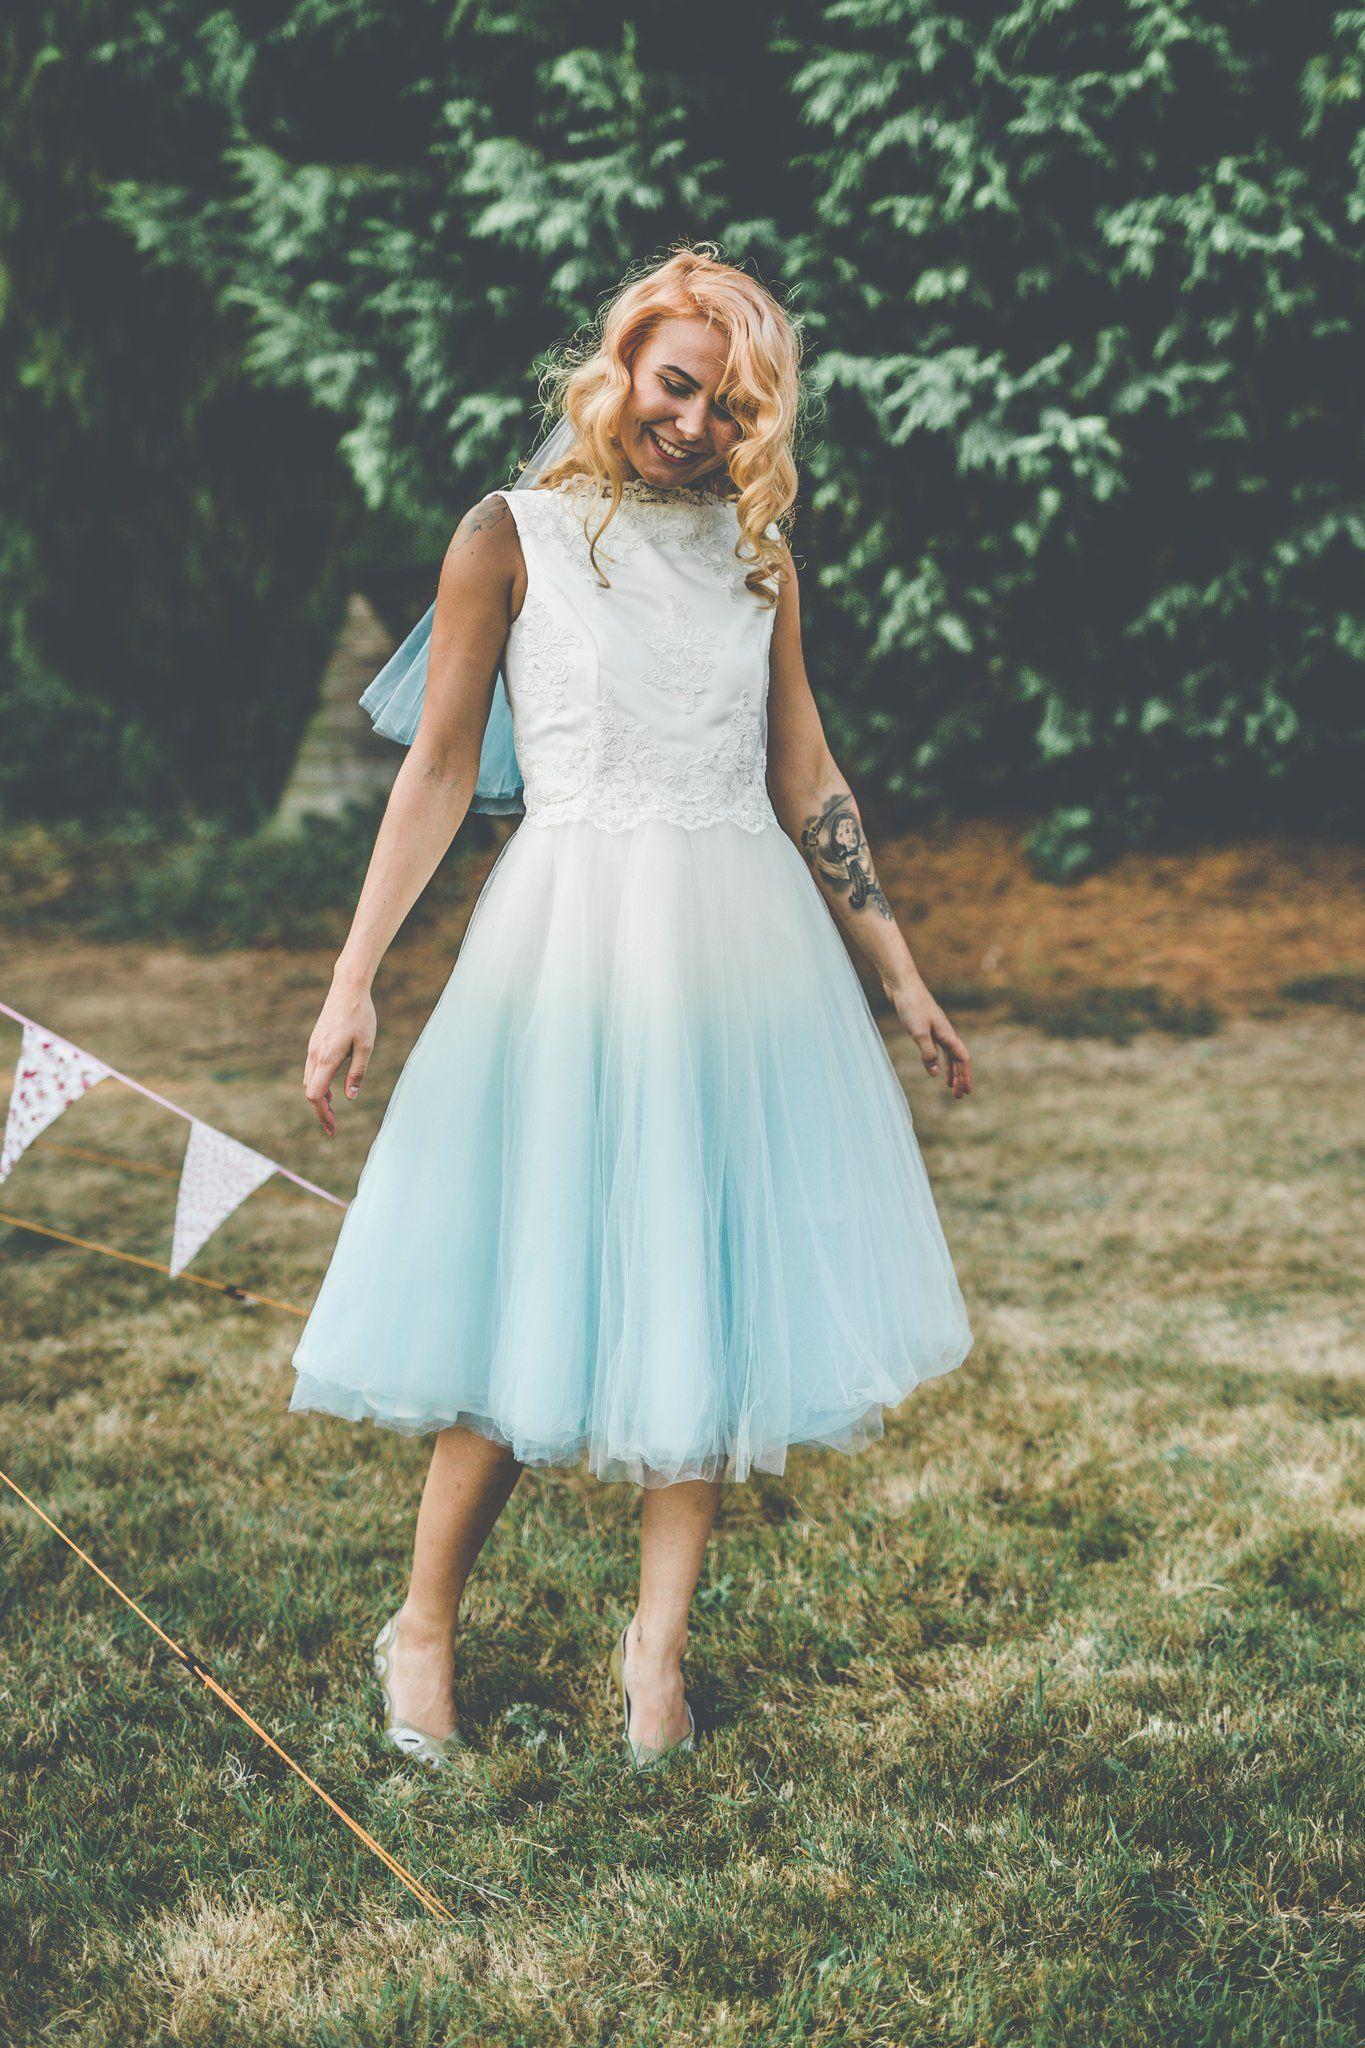 Gallery Lucy Can't Dance Dip dye wedding dress, Blue